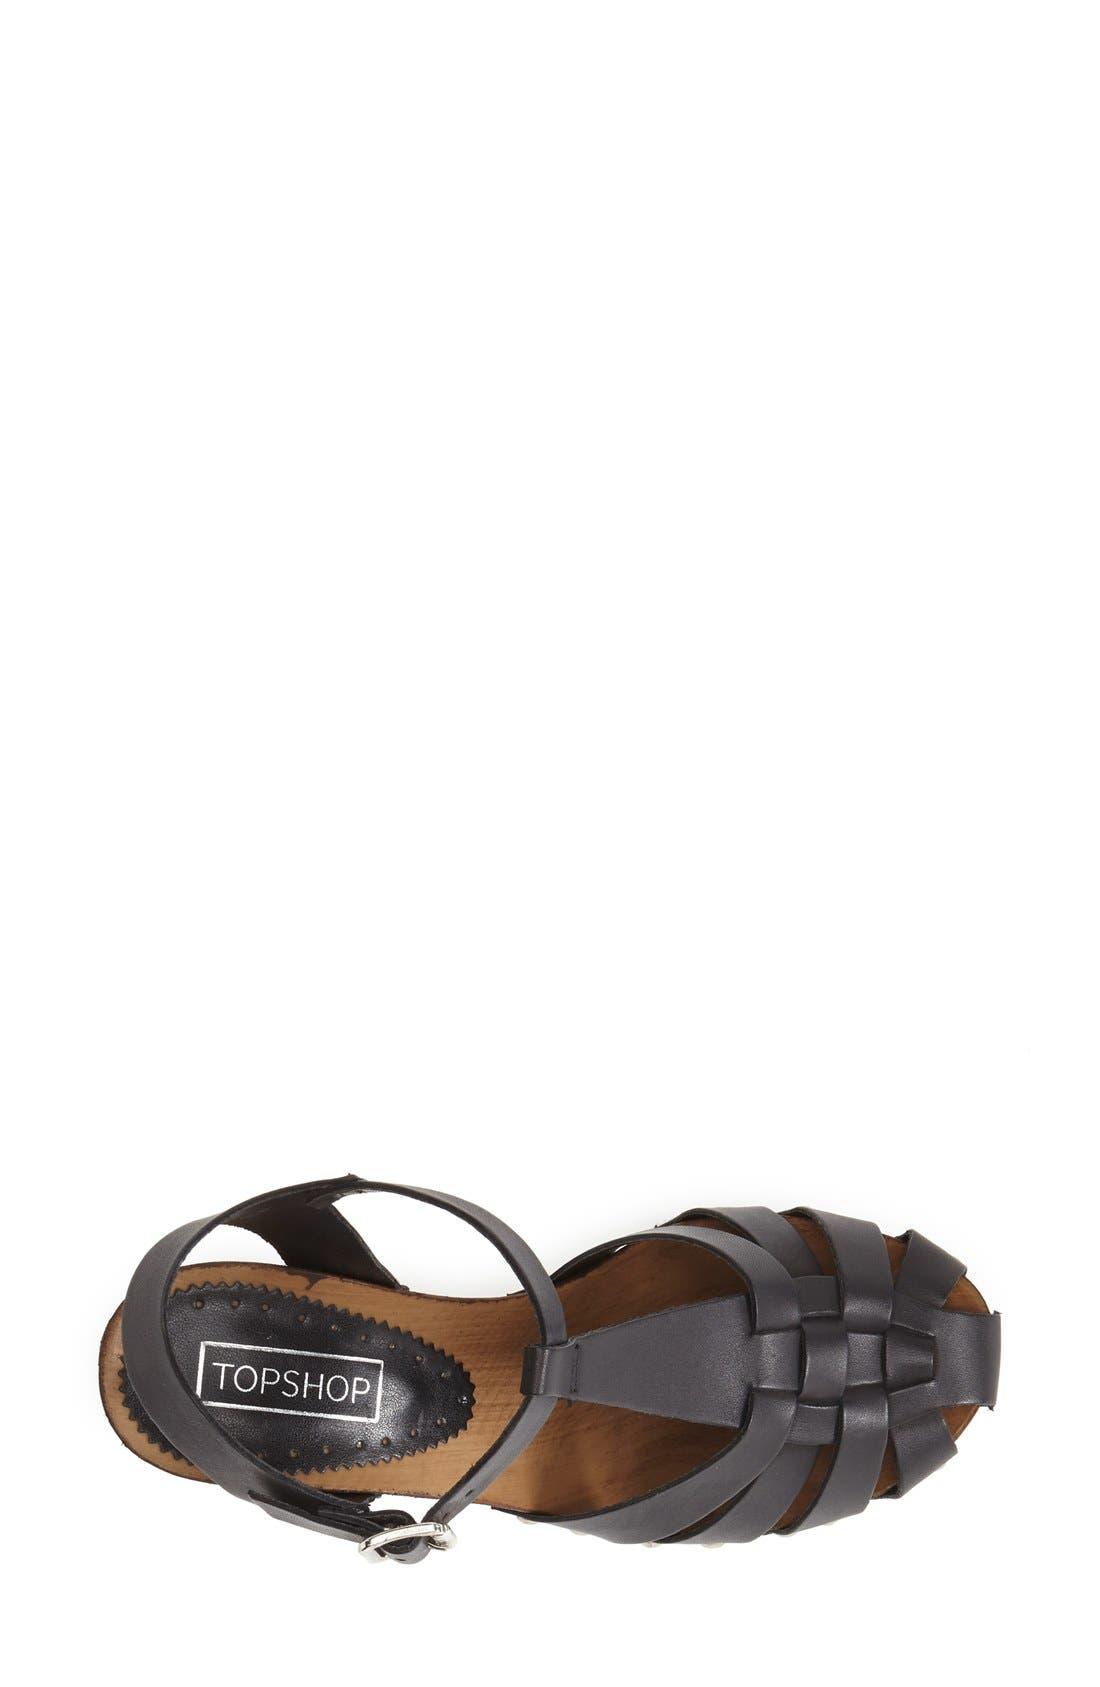 Alternate Image 3  - Topshop 'Nelly' Leather Platform Sandal (Women)